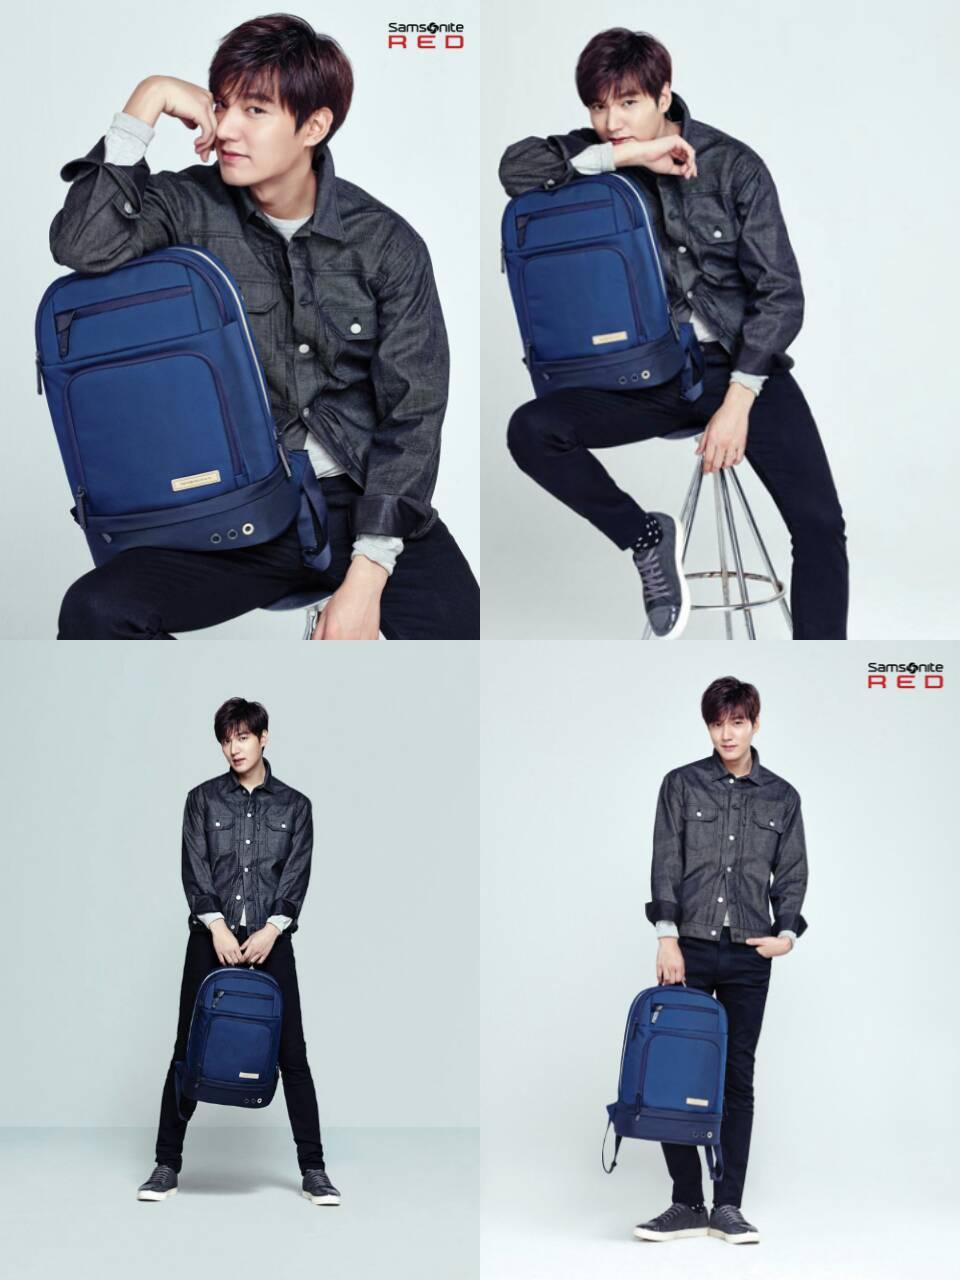 Lee Min Ho Samsonite (8)